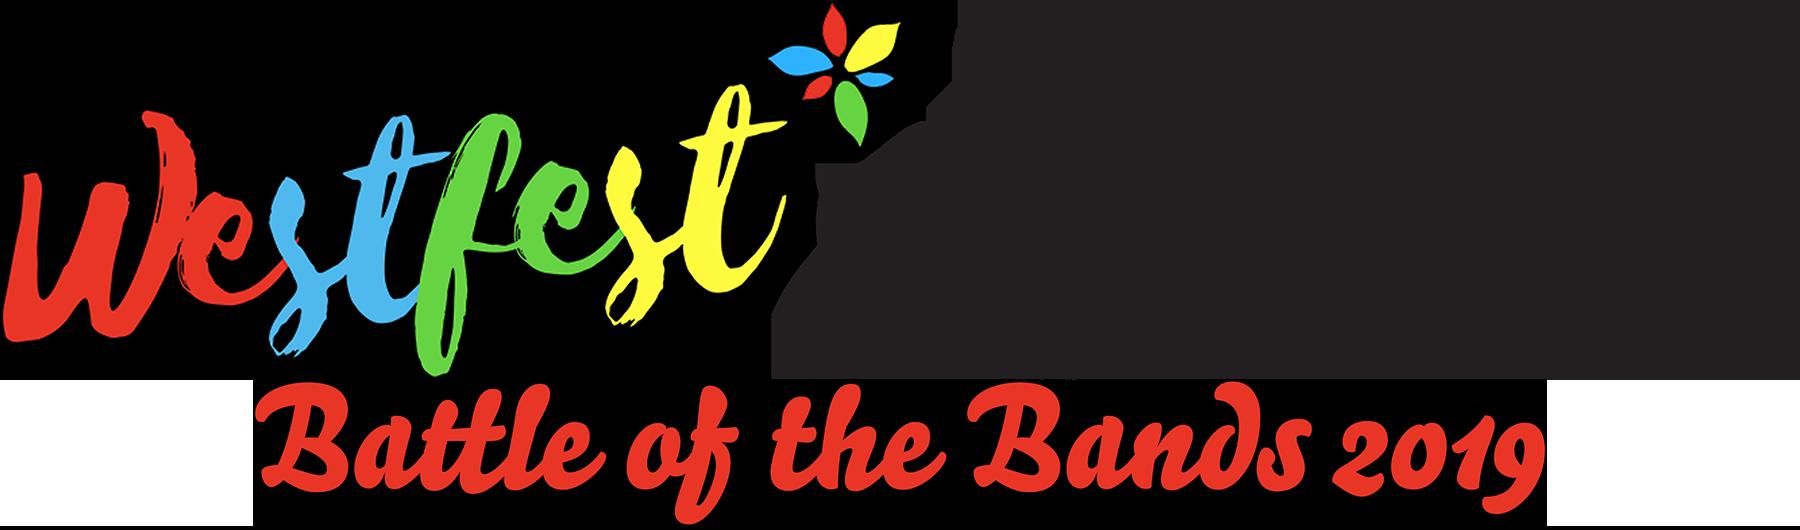 Dundee Heat 1 - WestFest & EH6 BOTB 2019